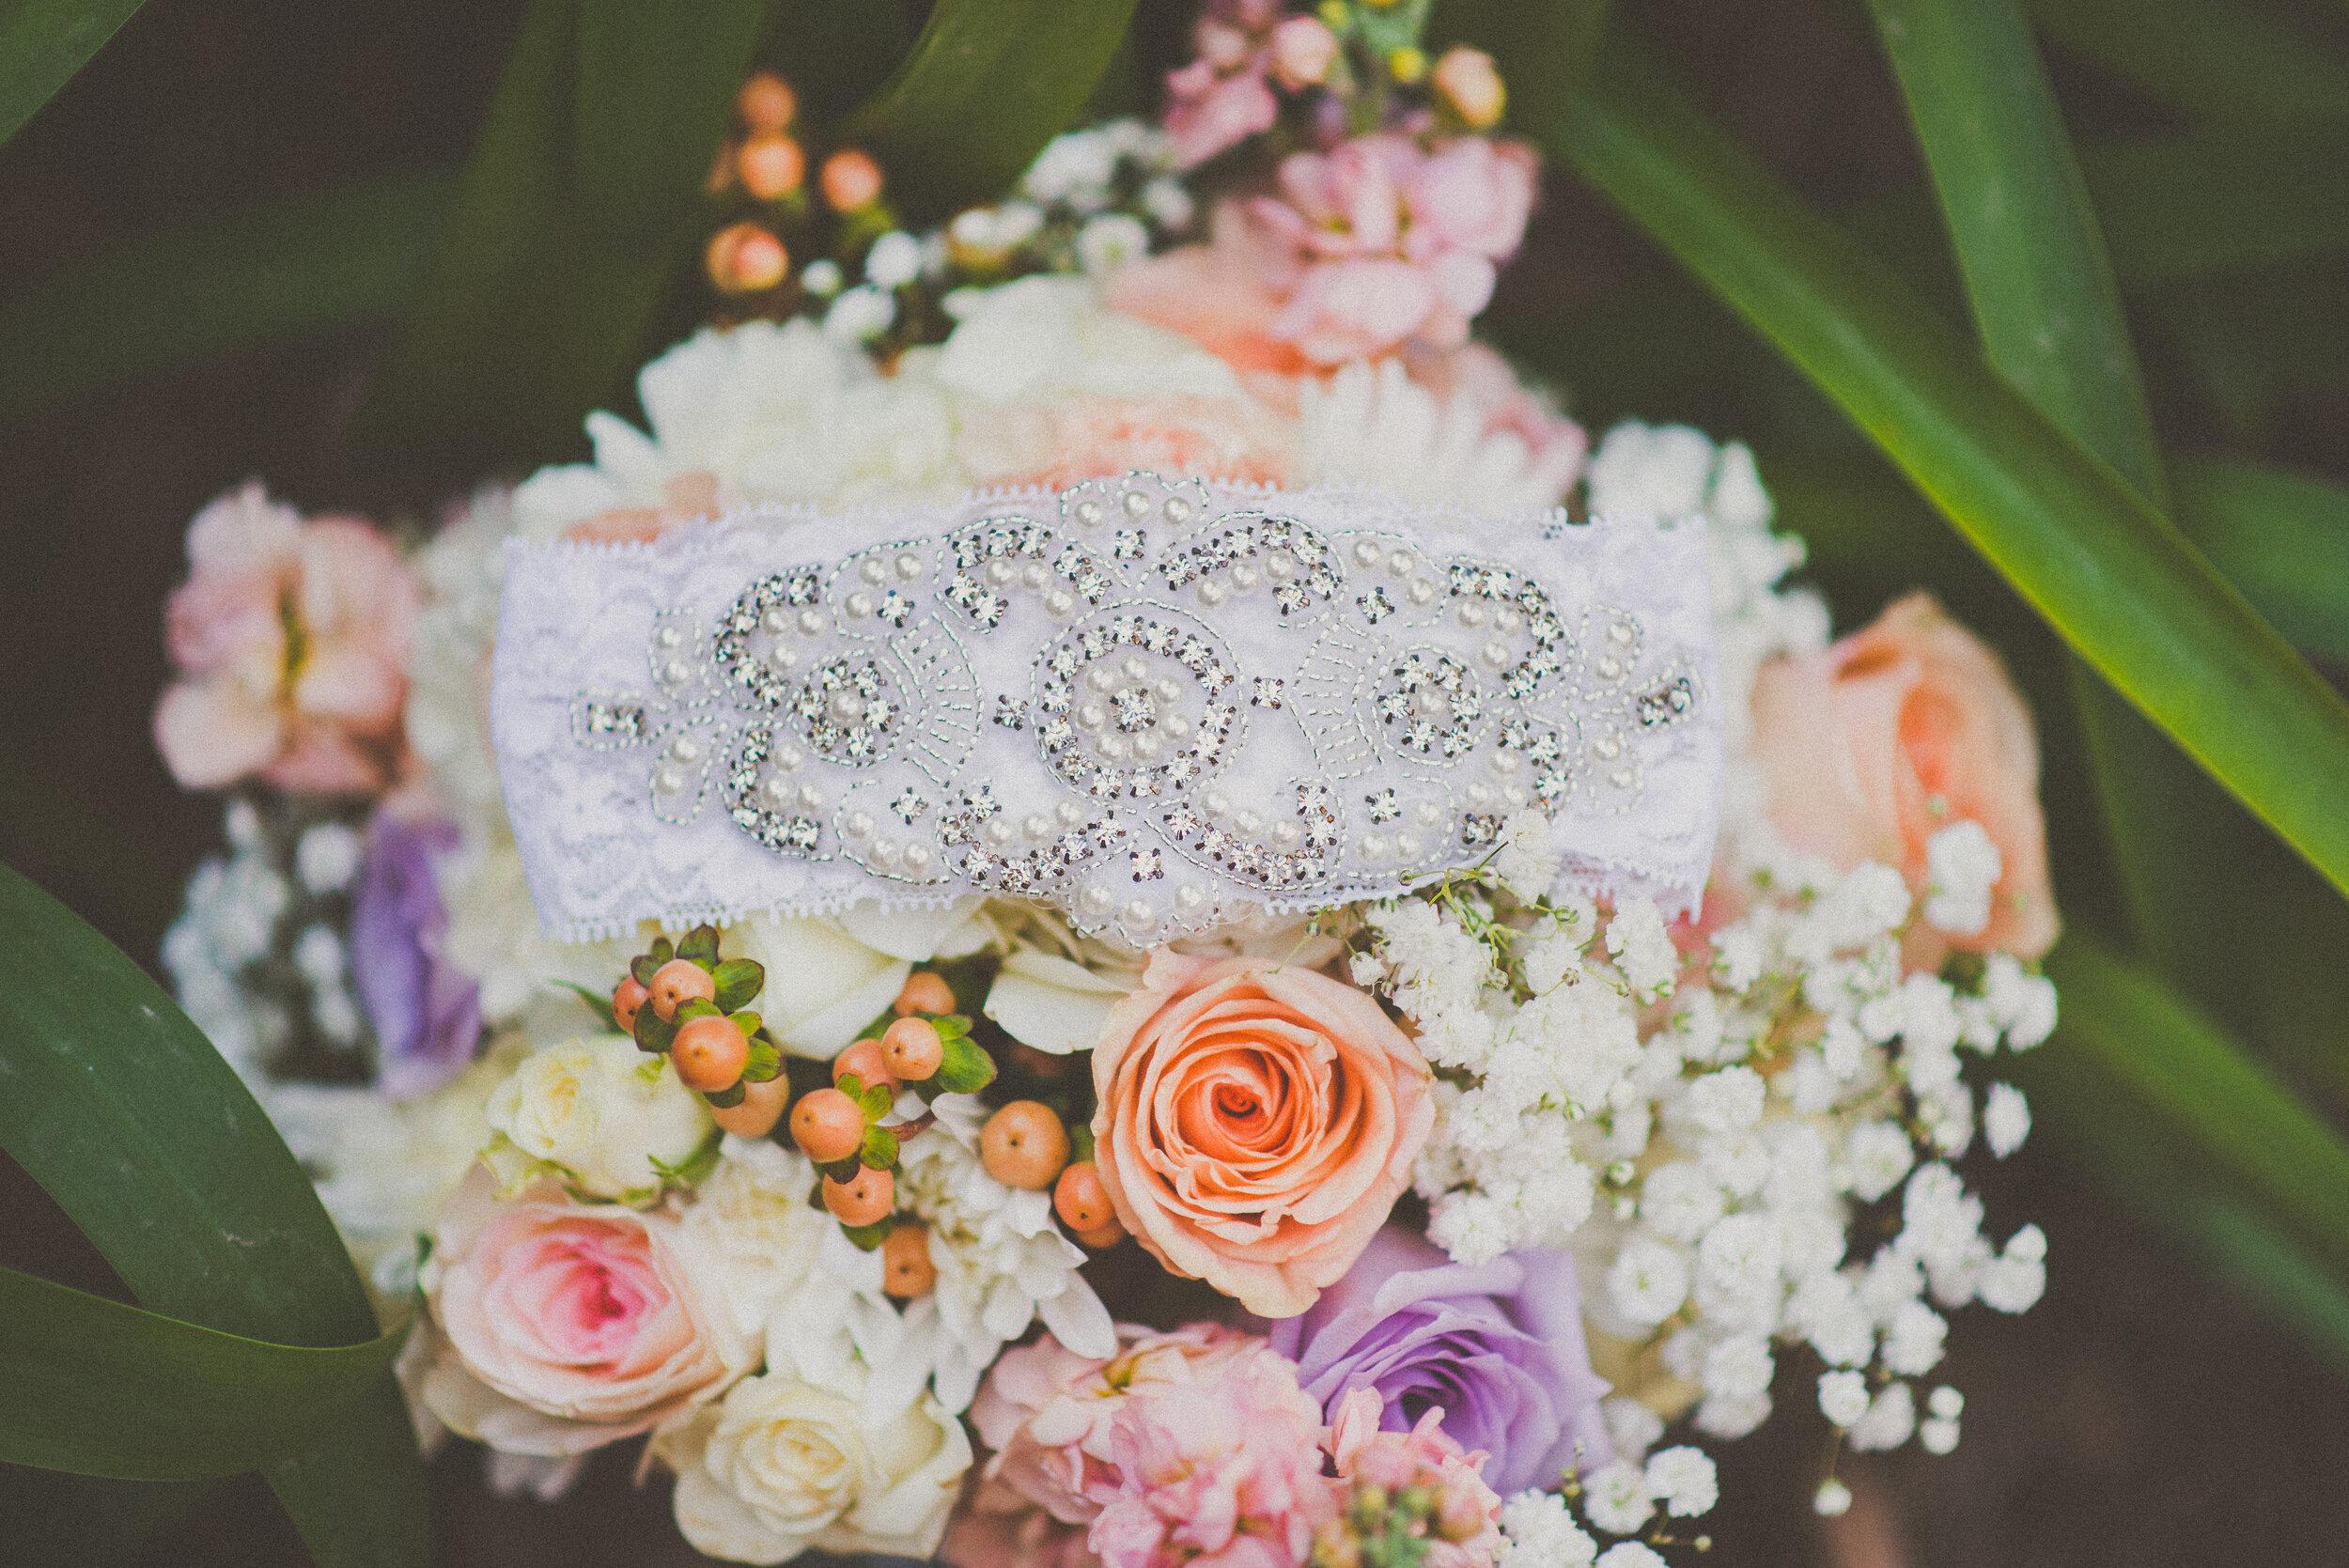 Roberts Wedding - Getting Ready-11.jpg